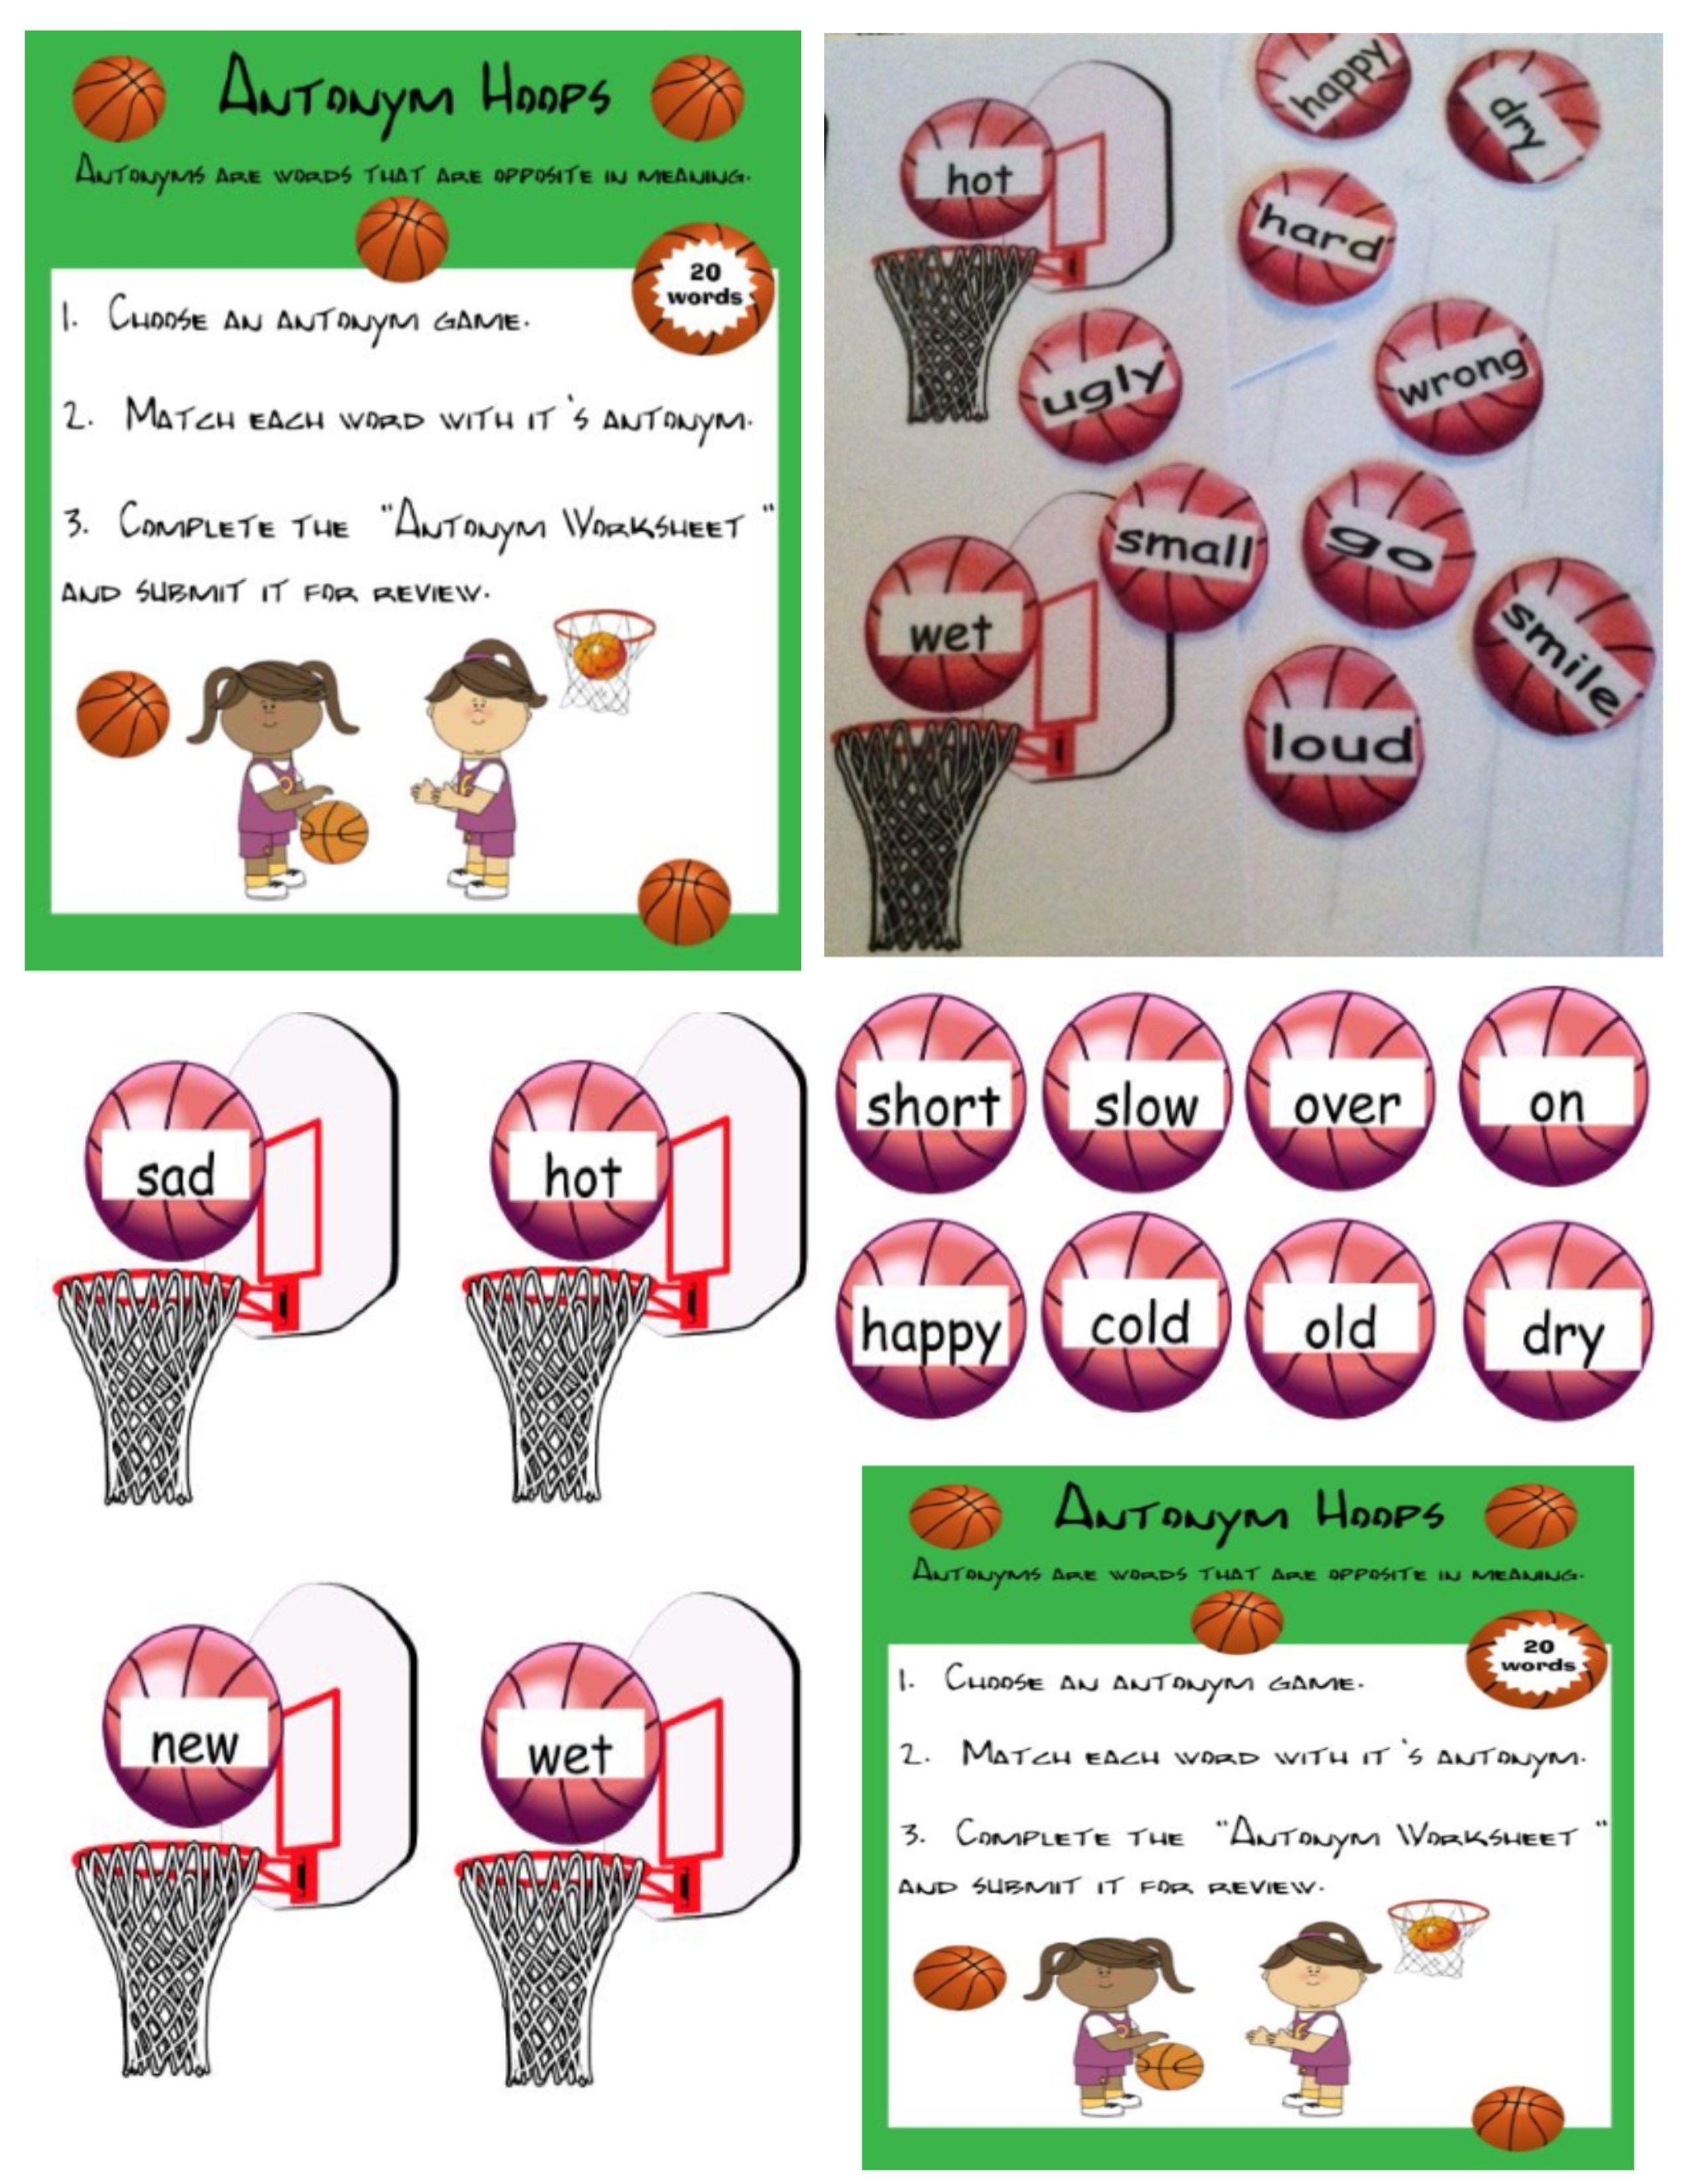 Antonym Hoops A Fun Antonym Basketball Game For Centers